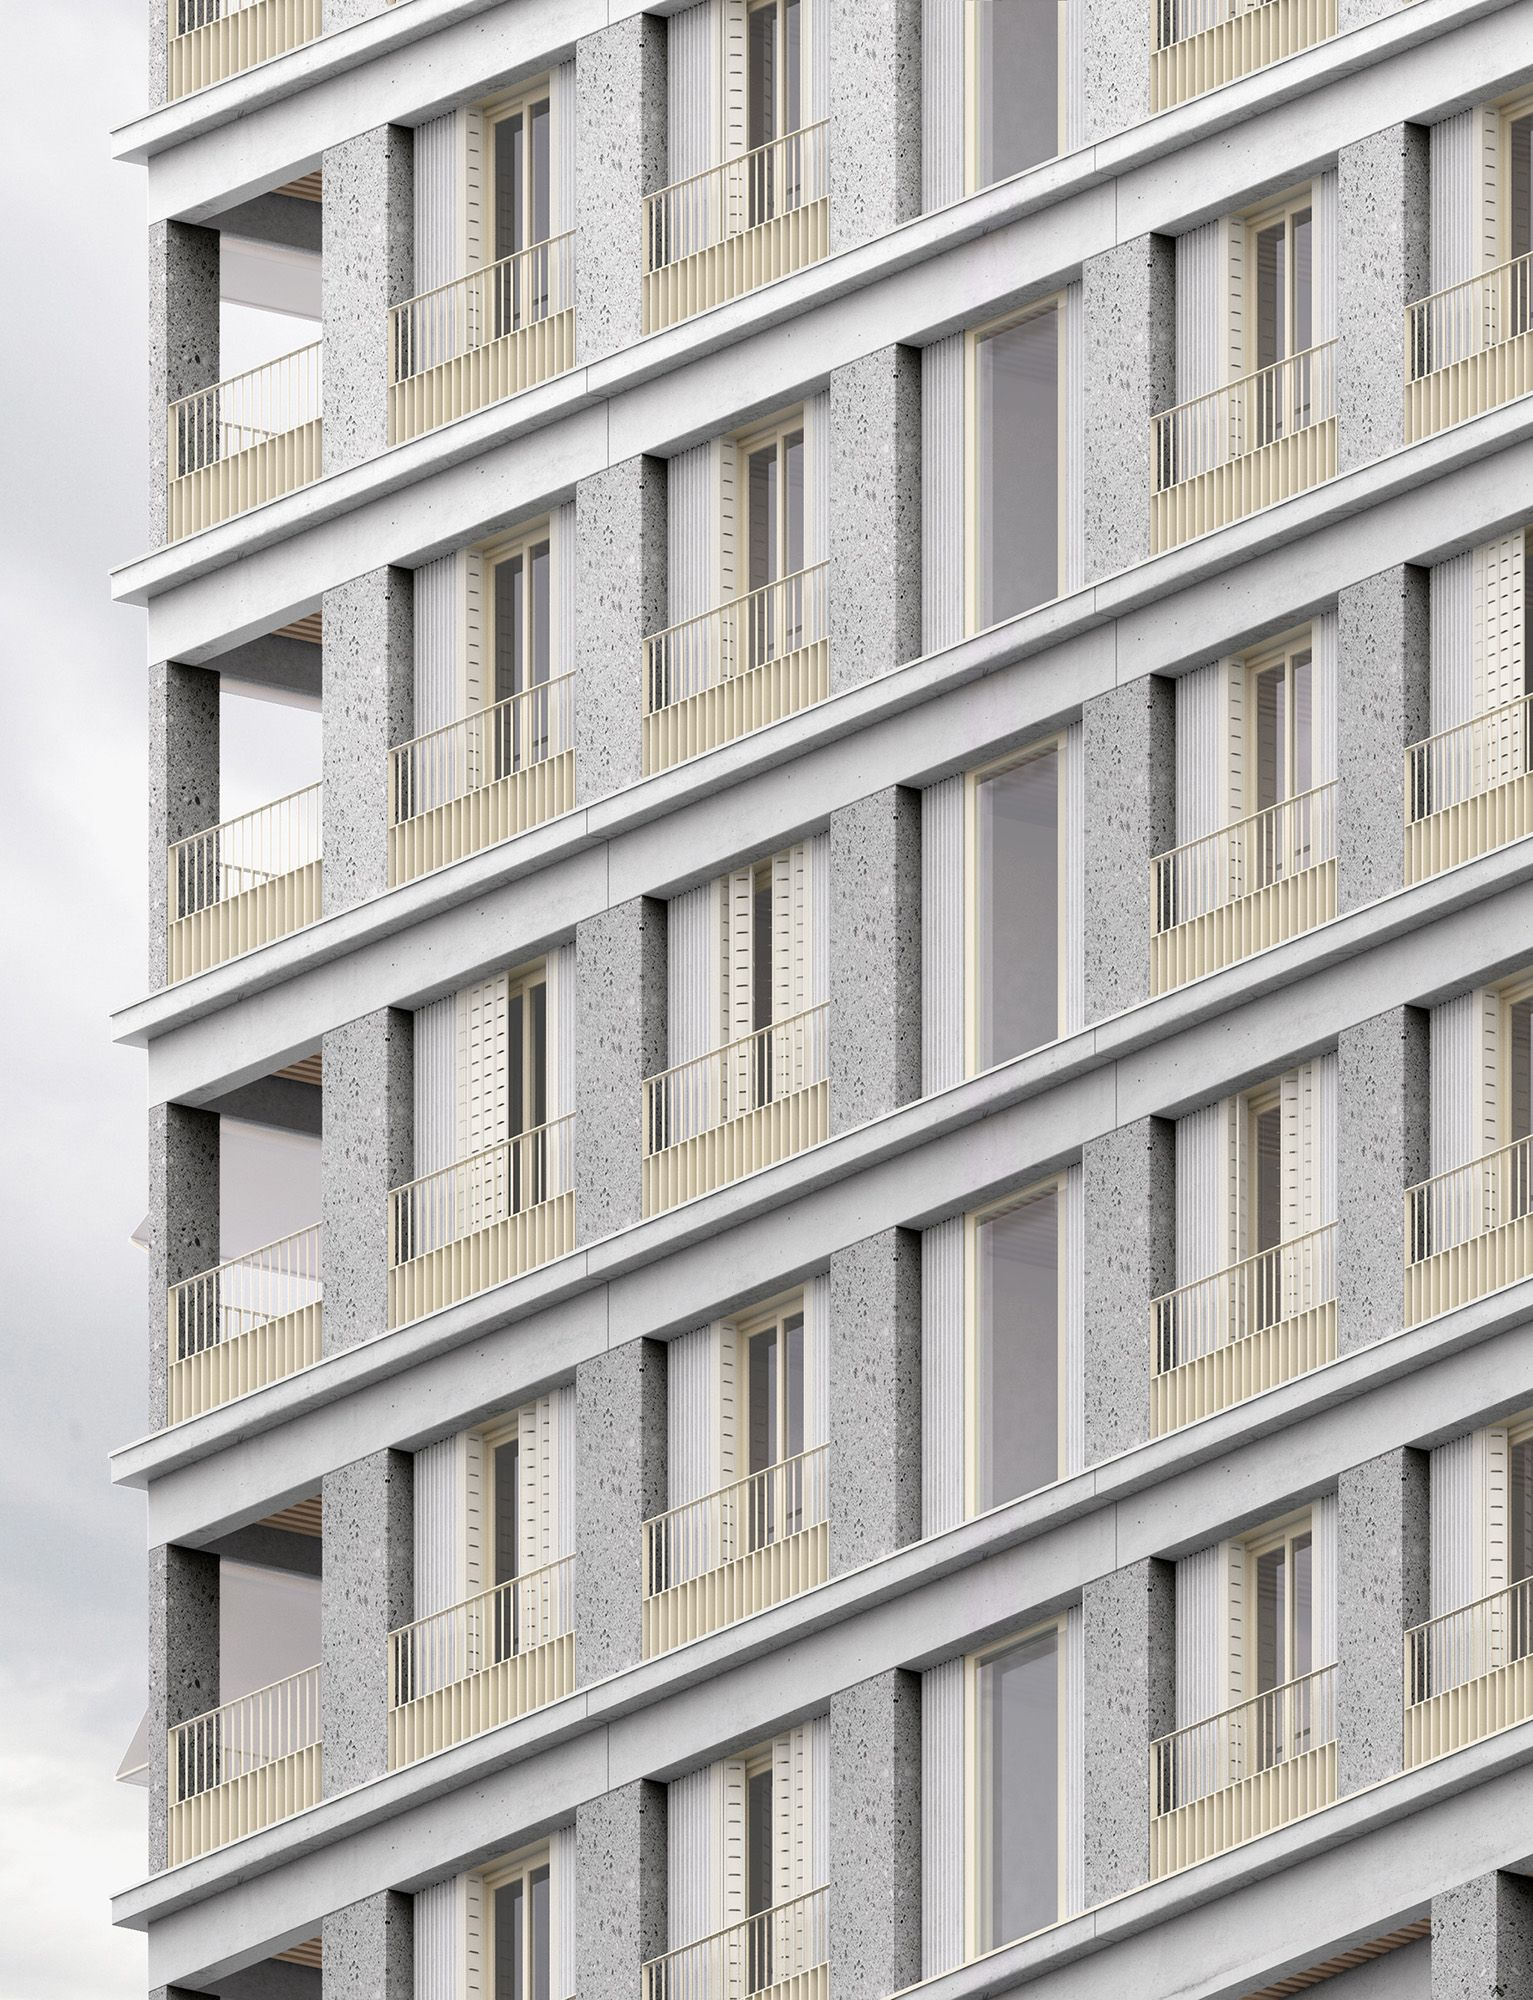 logements collectifs lyon confluence 4 facade pinterest logement lyon et fa ades. Black Bedroom Furniture Sets. Home Design Ideas